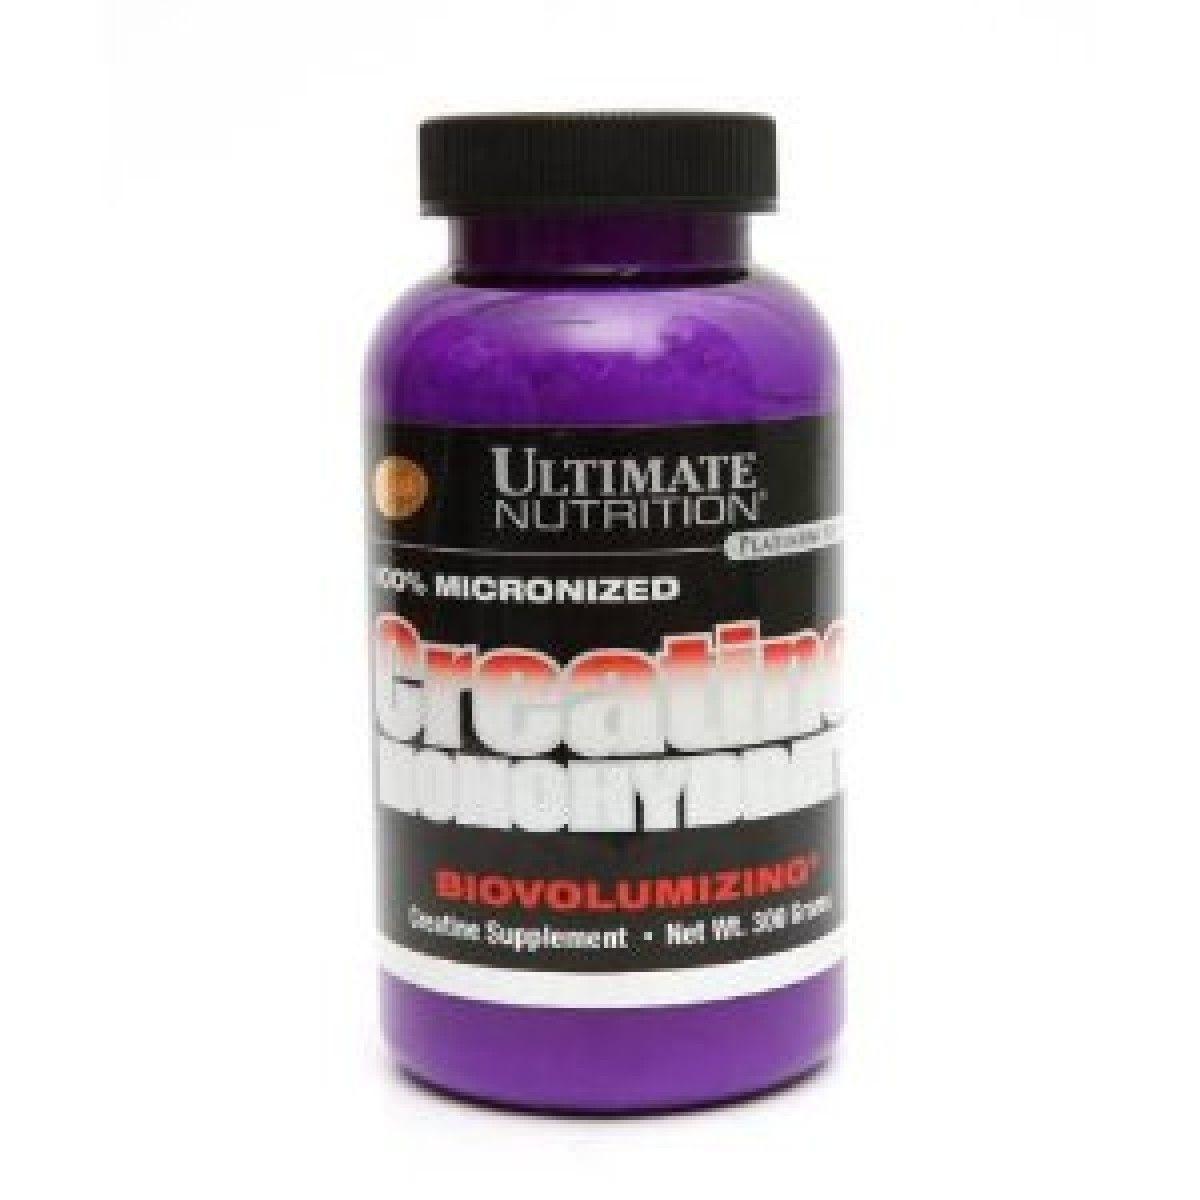 Ultimate Nutrition Creatine Monohydrate, 300 Gm Creatine